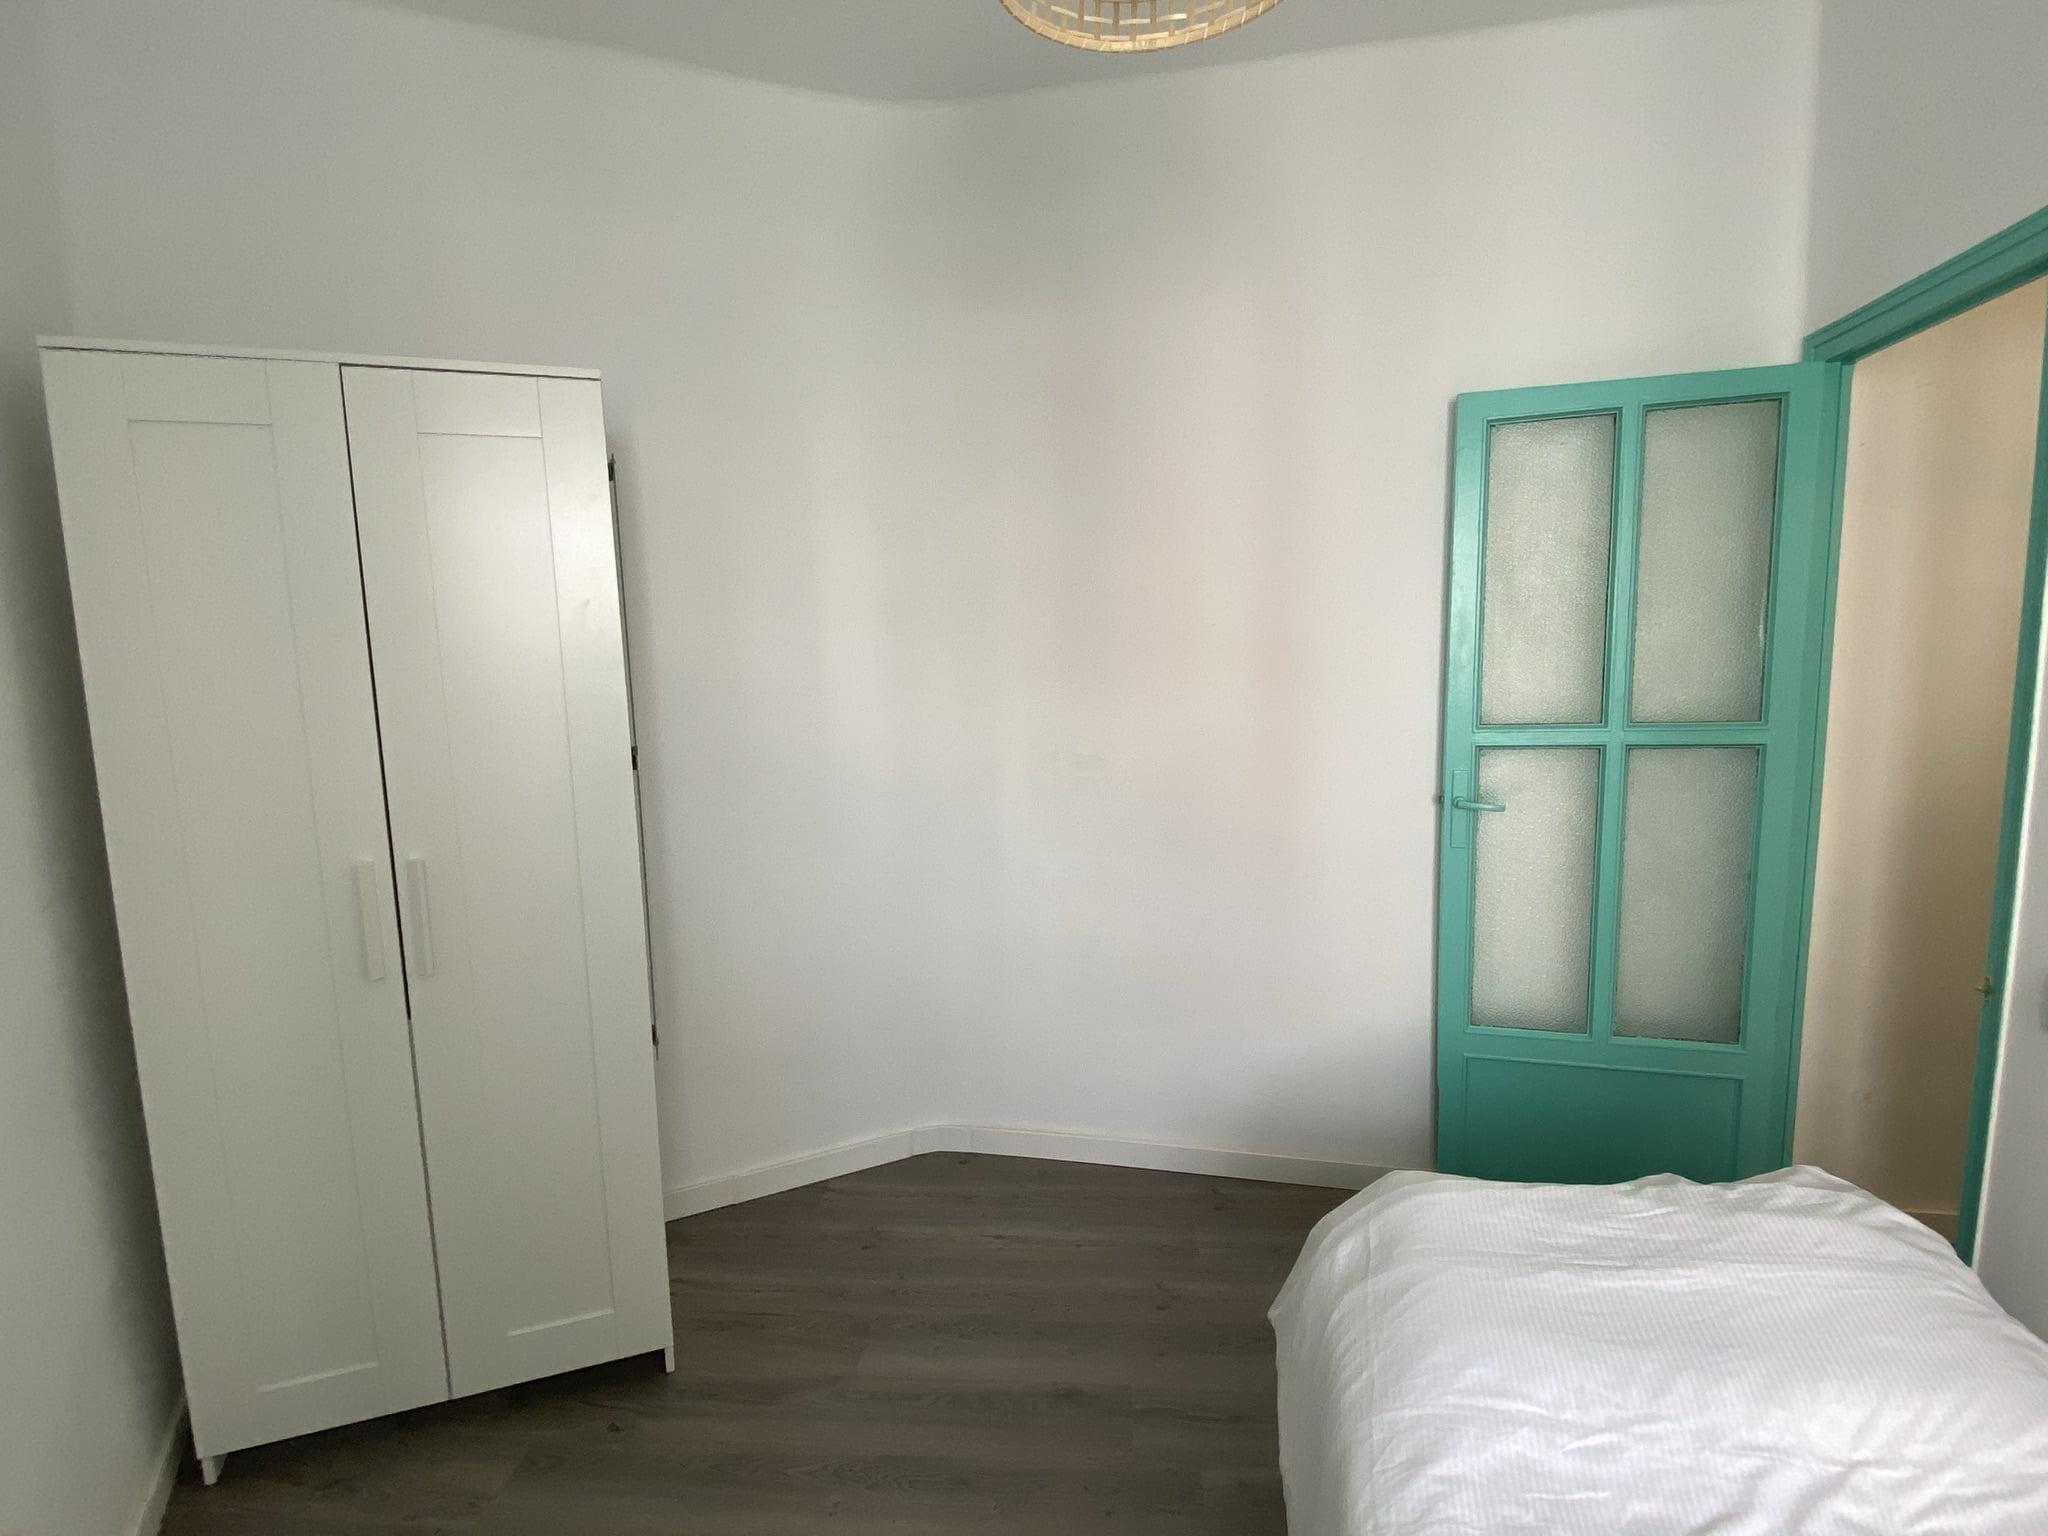 Bello - Beautiful furnished apartment in Valencia